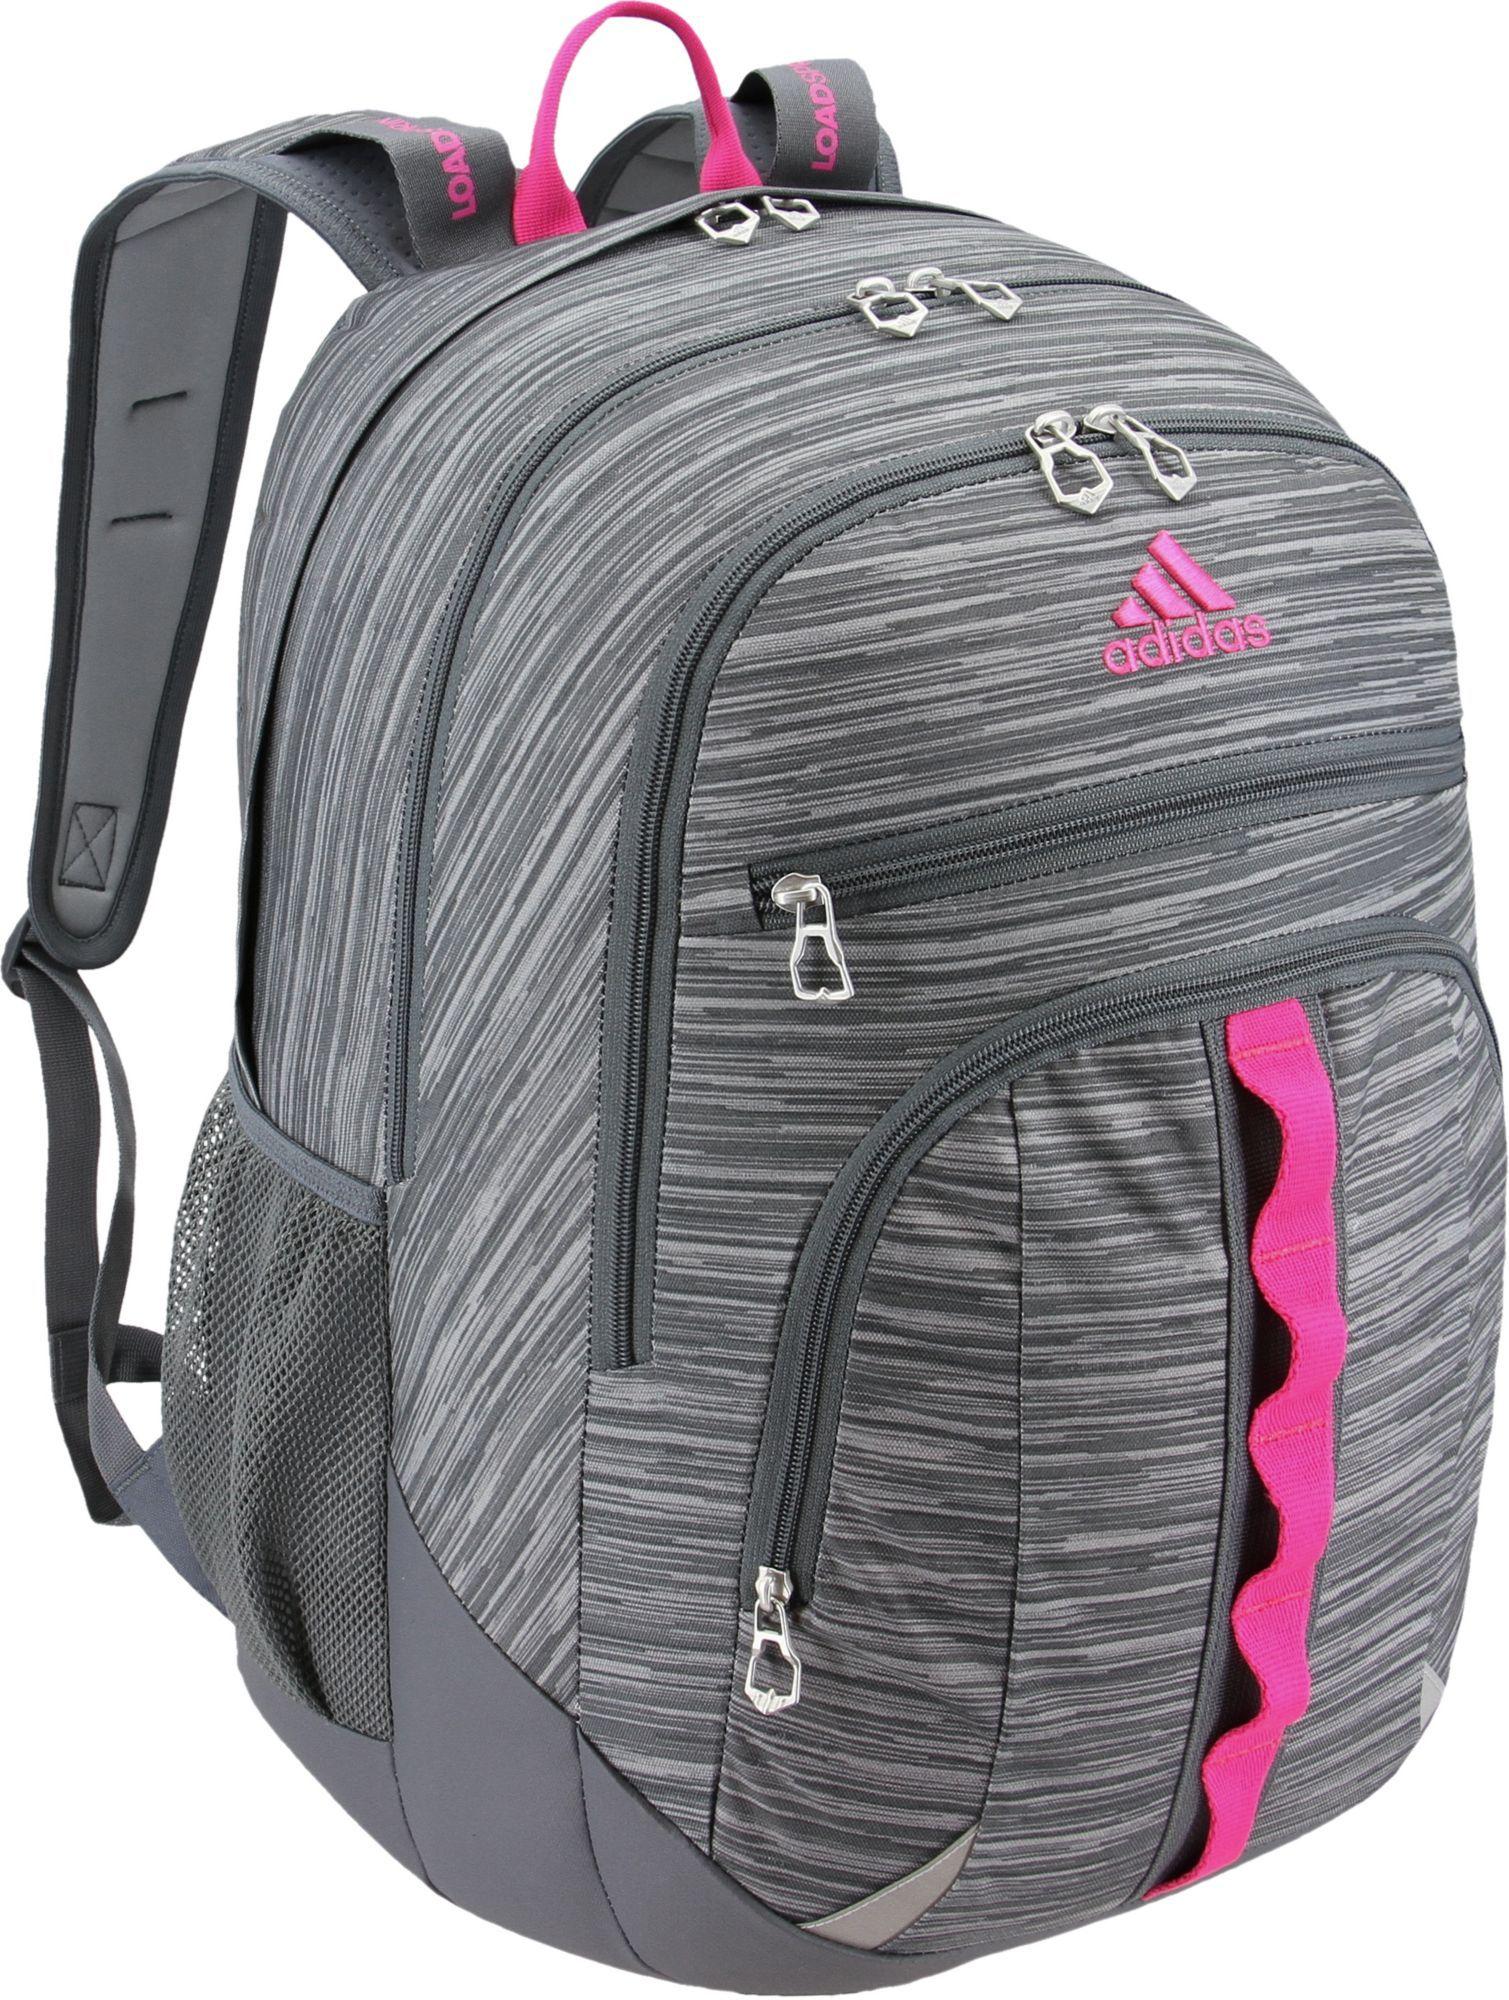 ddc9ea6221 adidas Prime IV Backpack in 2019